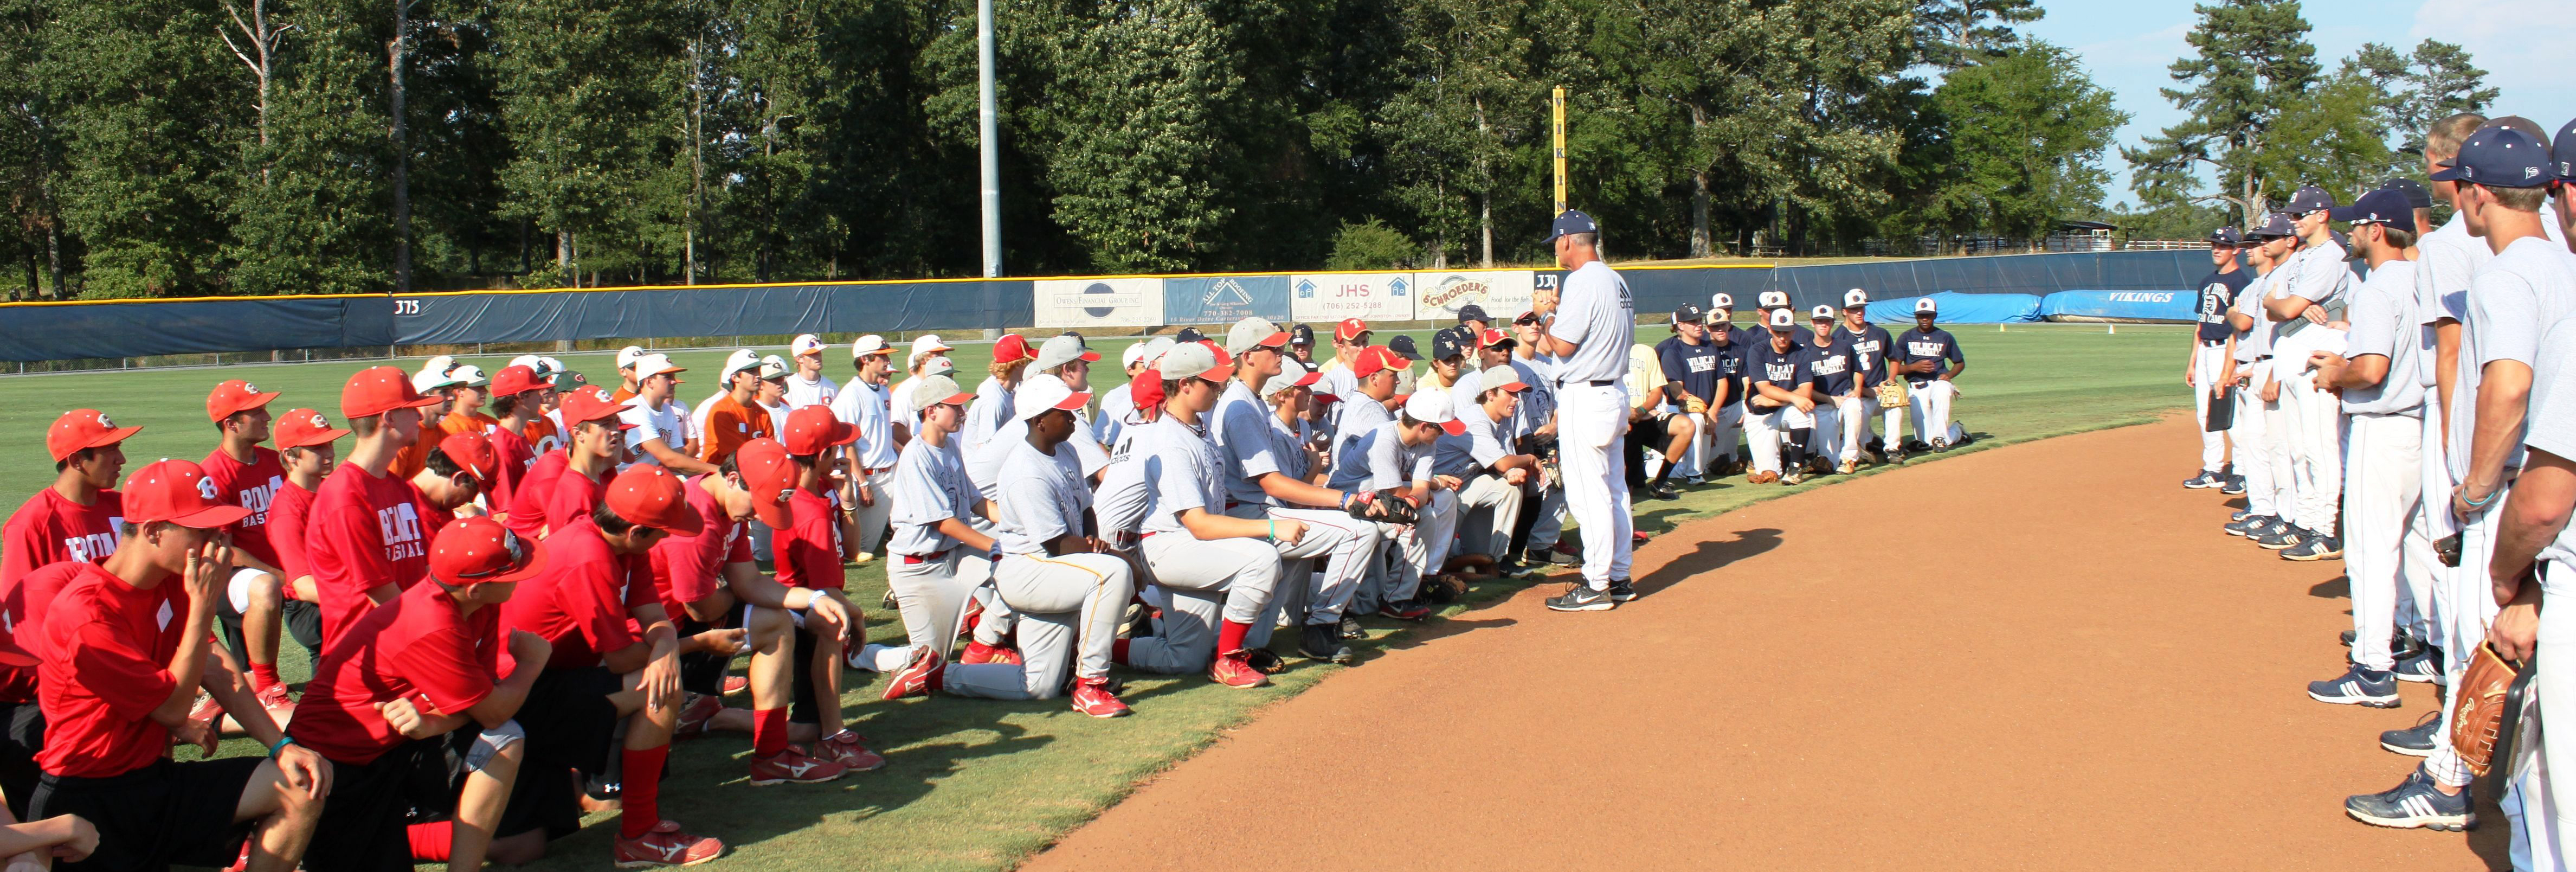 David Beasley Baseball Camps At Berry College Mt Berry Georgia David Beasley Baseball Camps